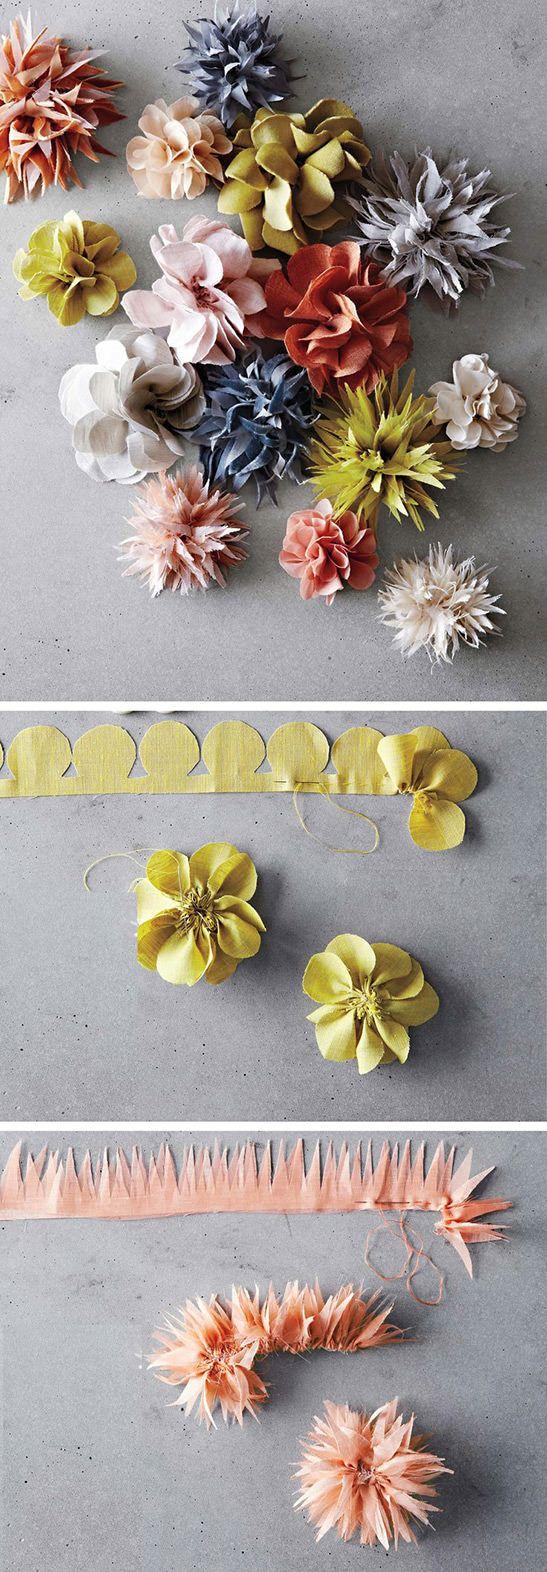 DIY Wild Flowers: